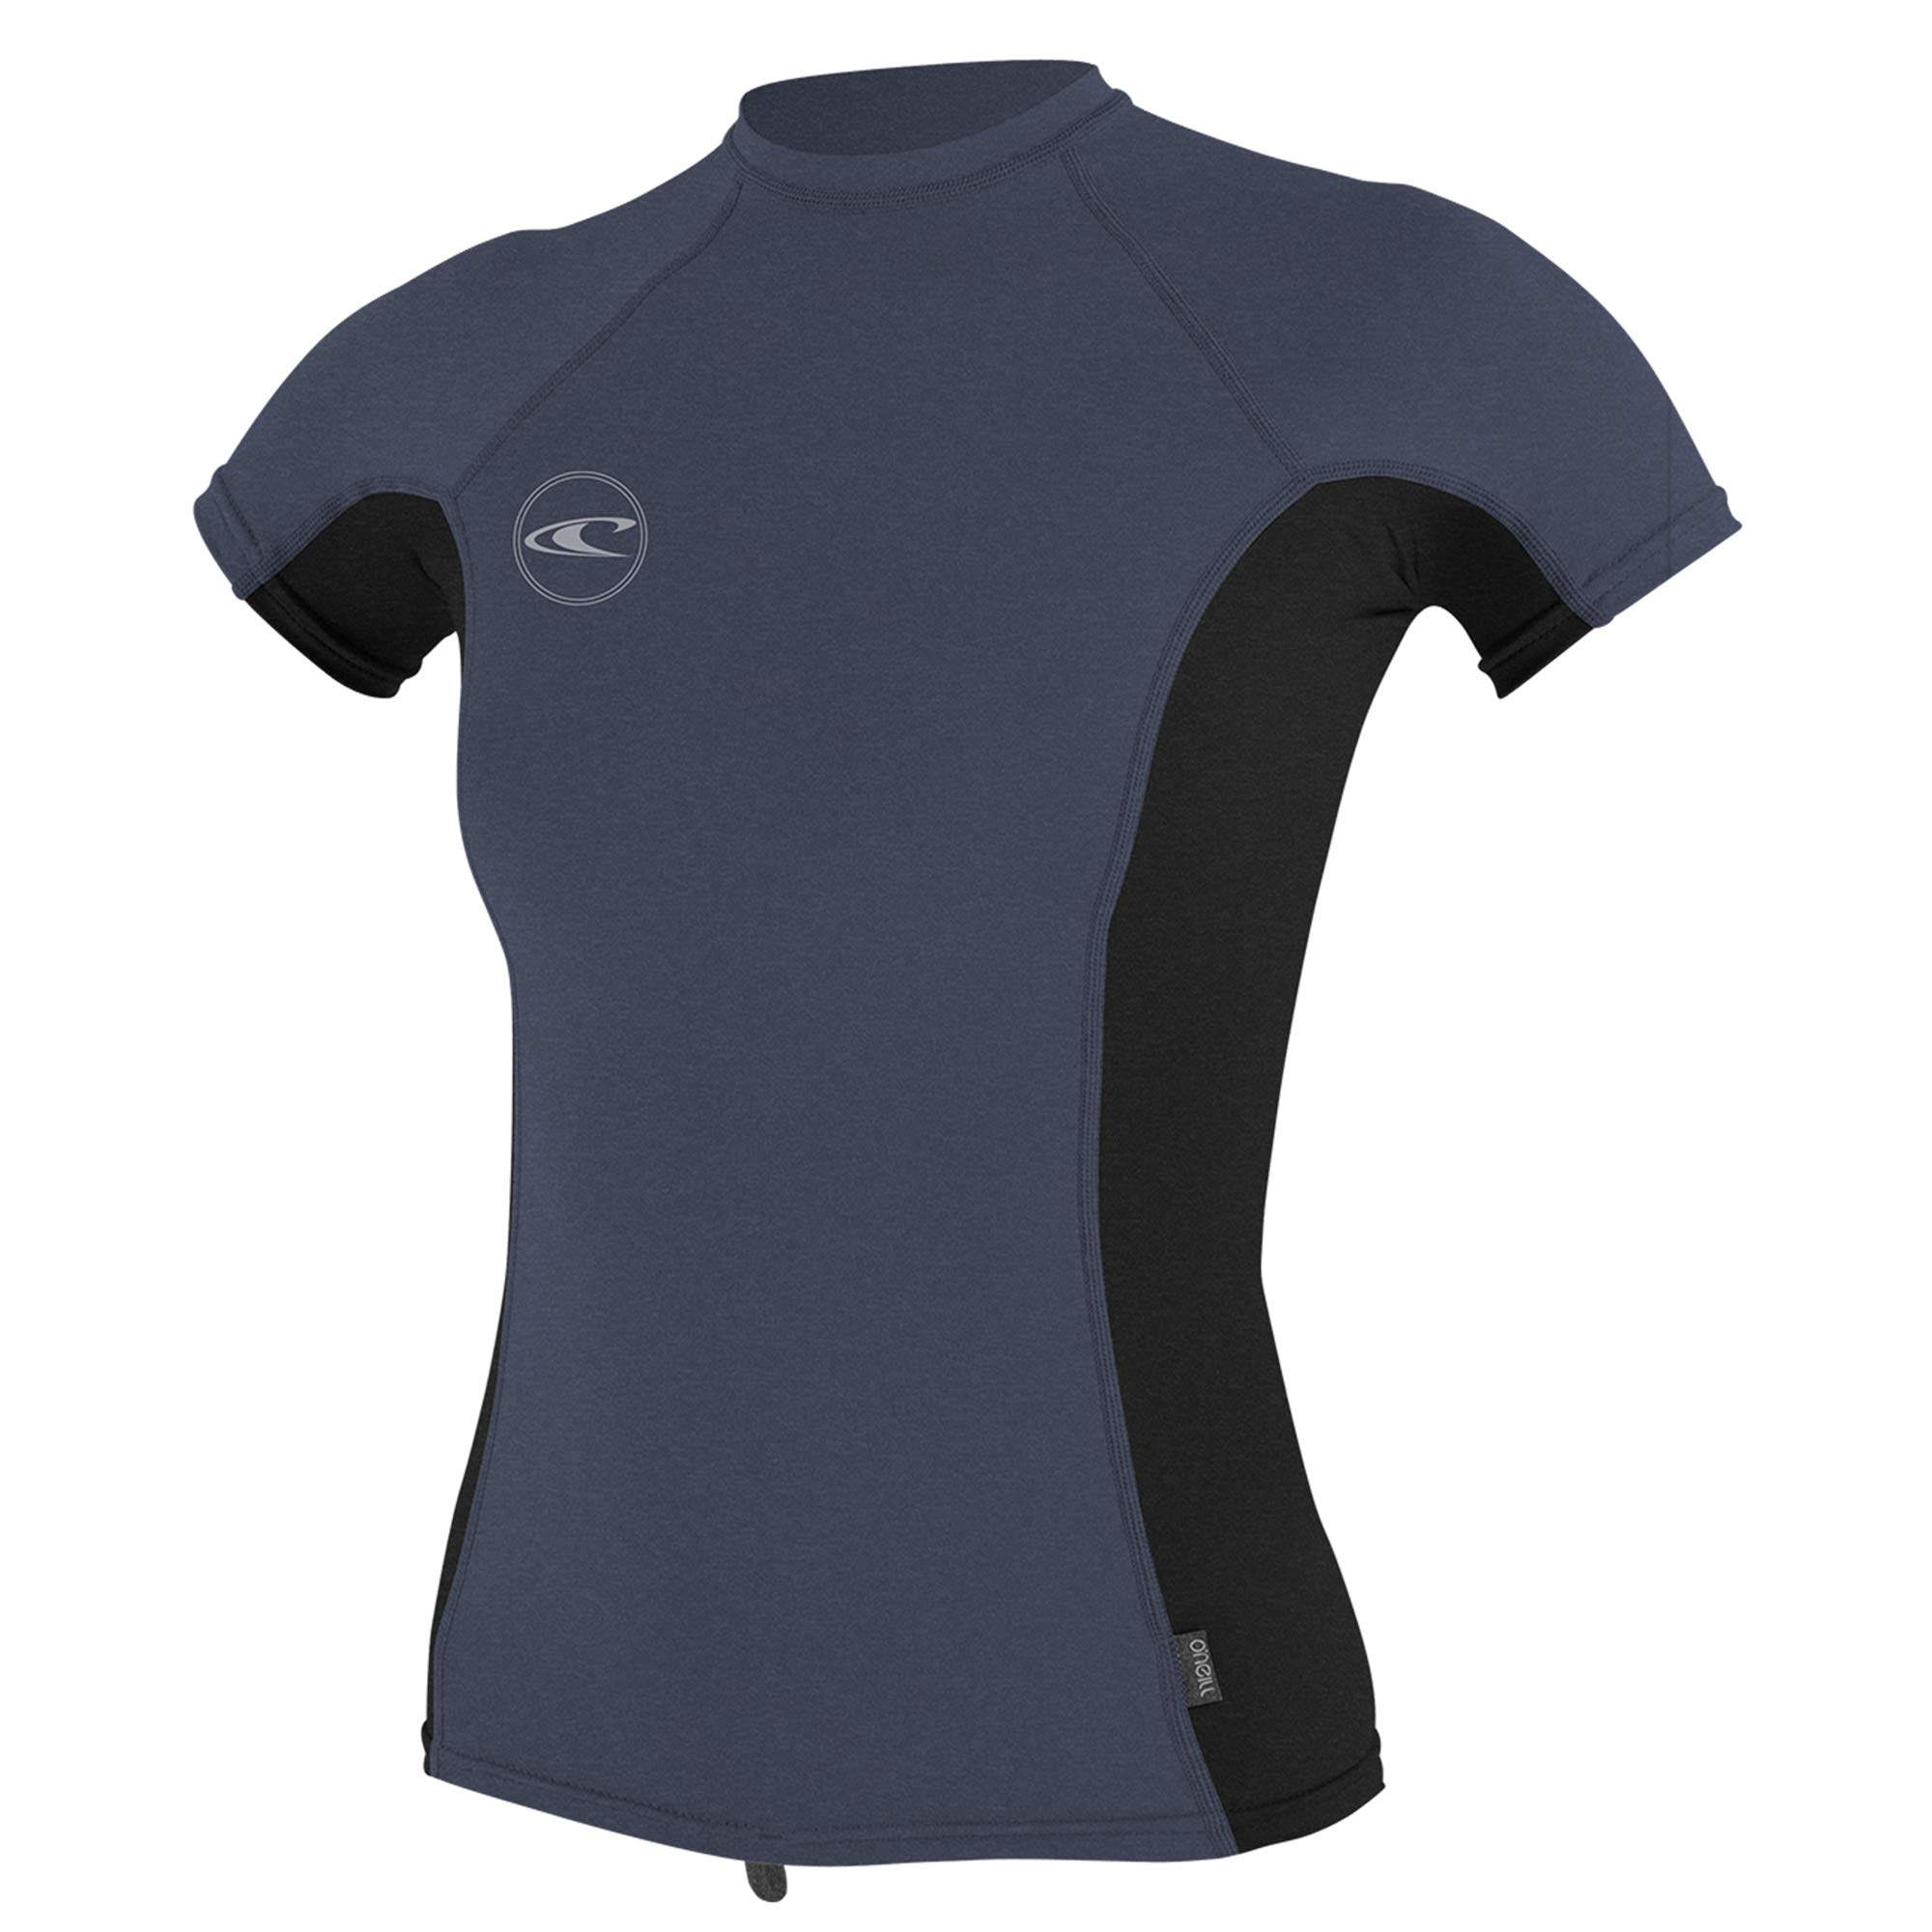 O'NEILL Oneill Womens Hybrid Short Sleeve Rash Guard - Mist Black Mist - Mist Black Mist Premium, Small by O'NEILL